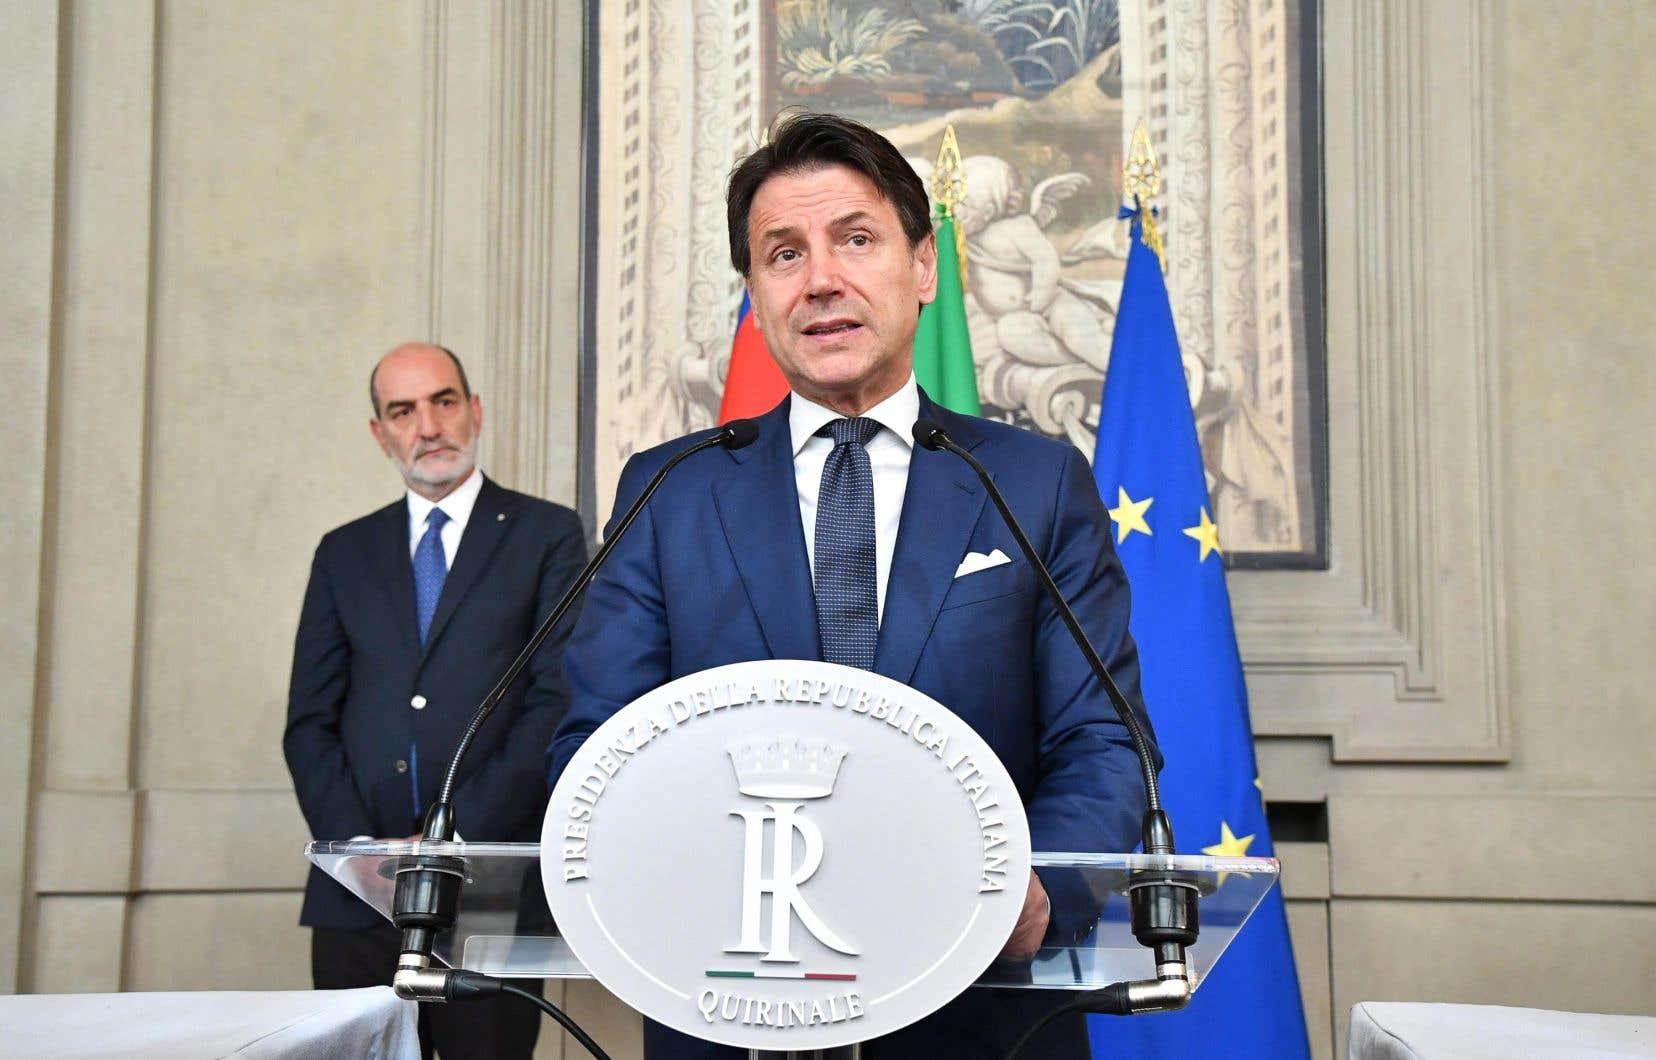 Le premier ministre italien sortant, Giuseppe Conte, jeudi à Rome